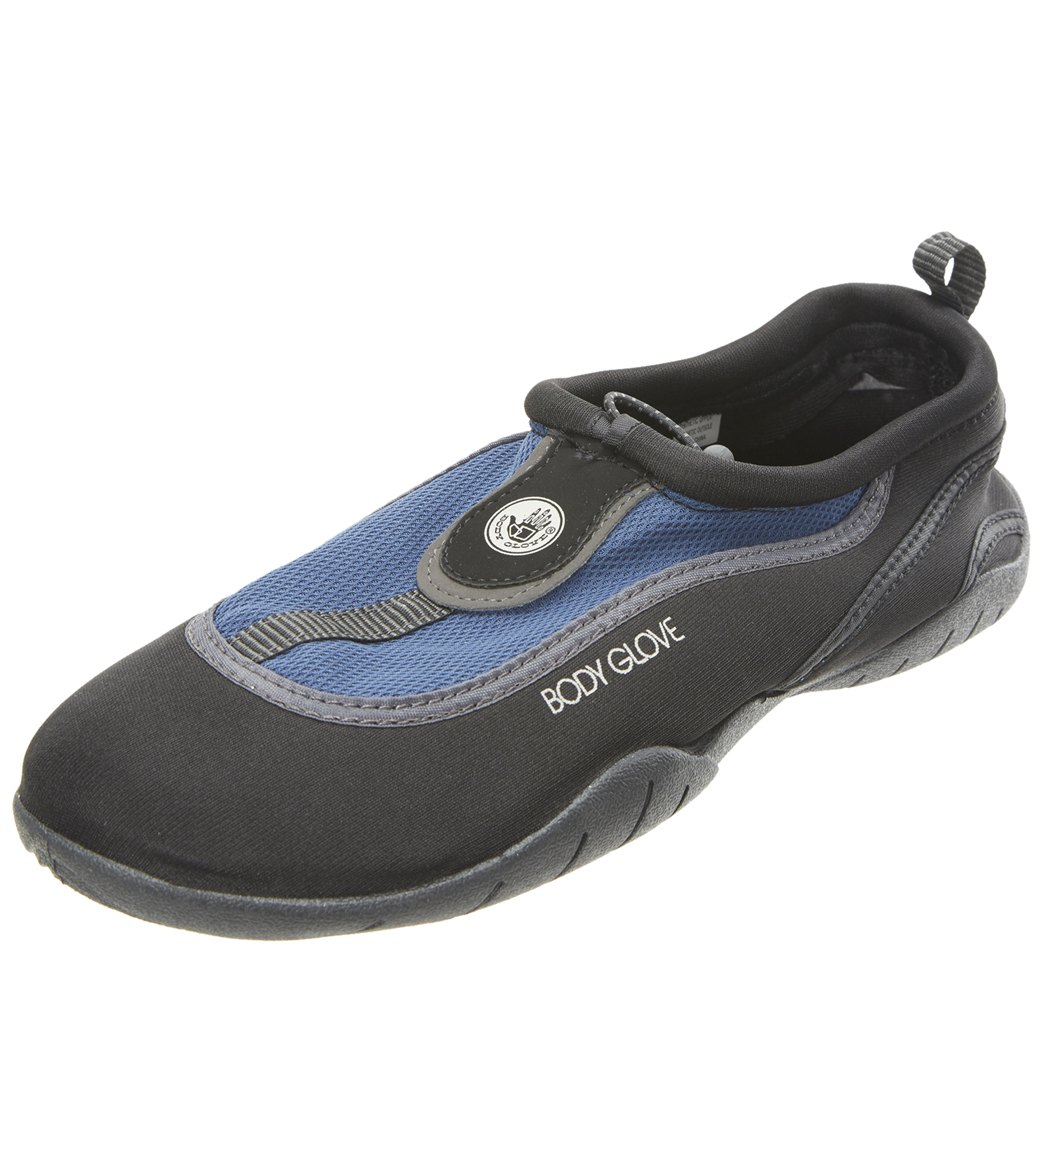 72cbfeb22112 Body Glove Men s Riptide III Water Shoe at SwimOutlet.com